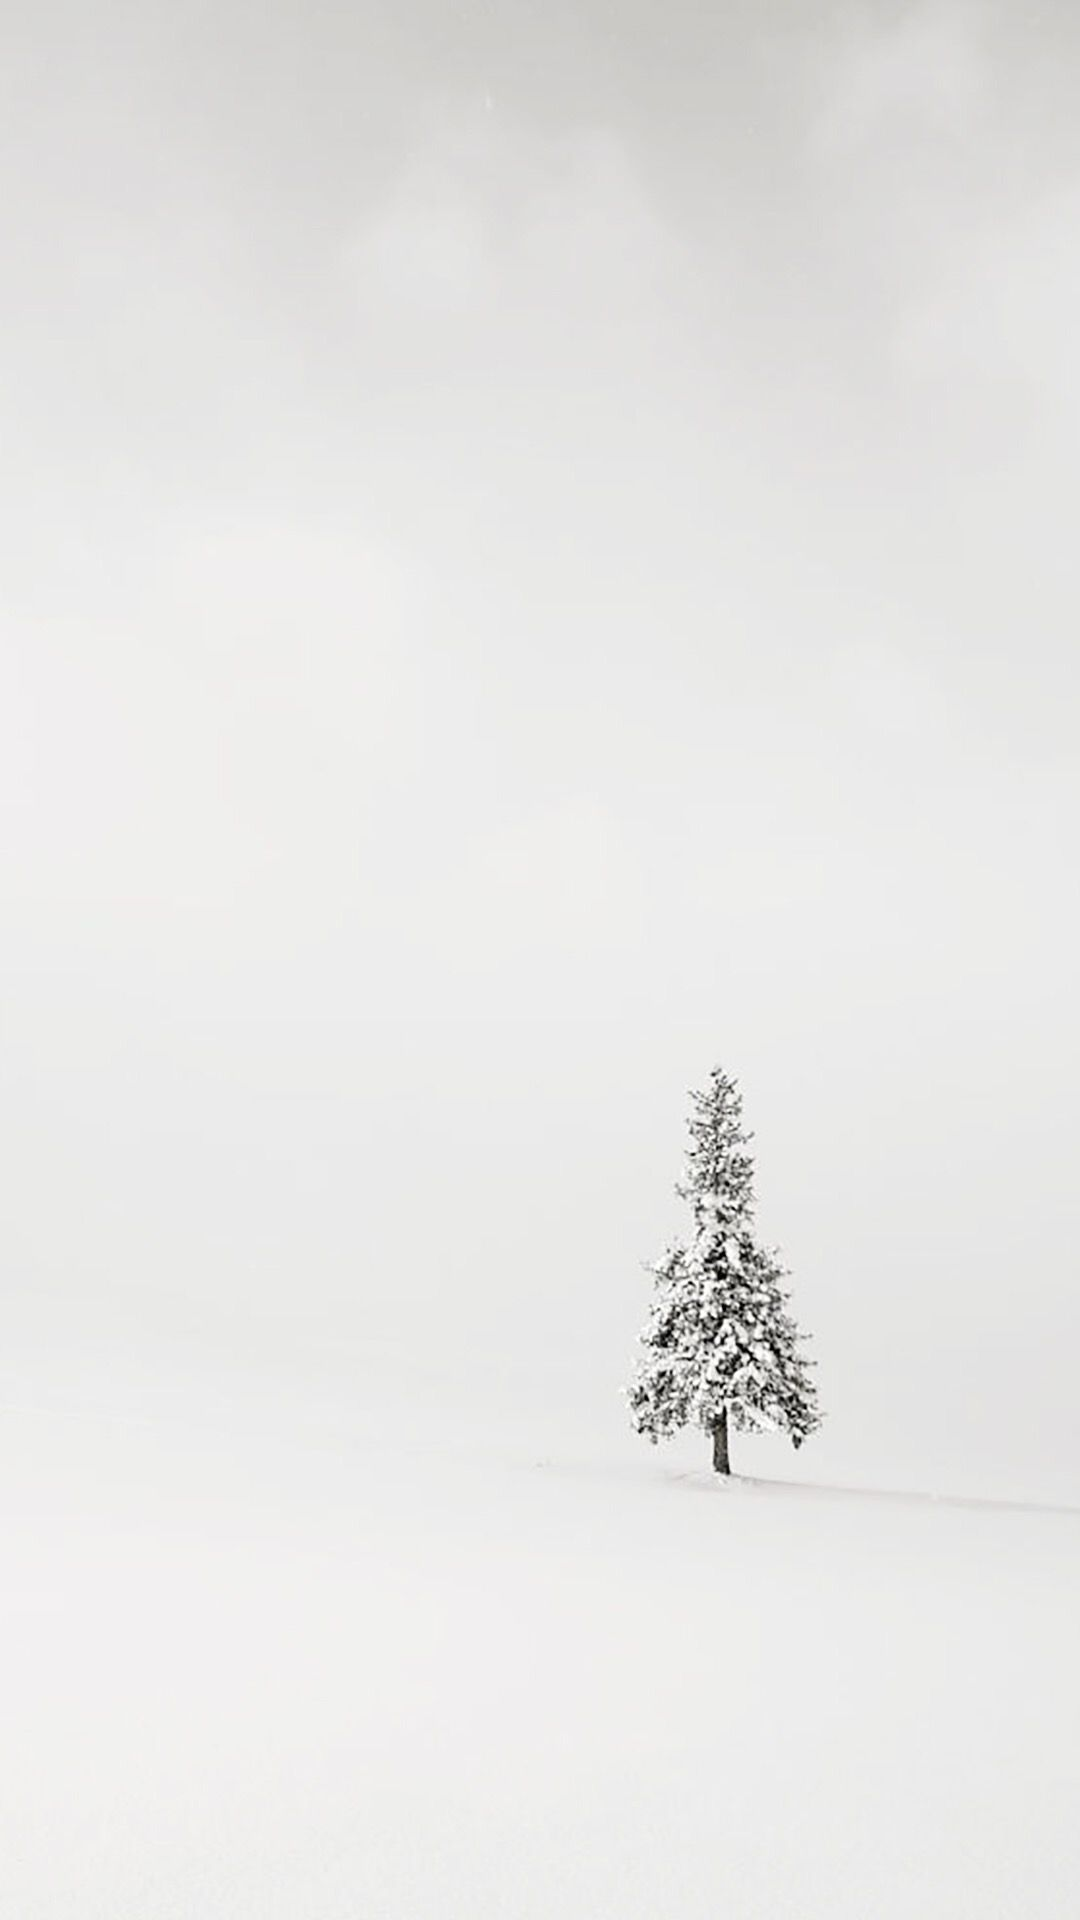 Iphone Tree Simple Minimalistic White Wallpaper Minimalist Wallpaper Tree Wallpaper Iphone Christmas Tree Wallpaper Iphone